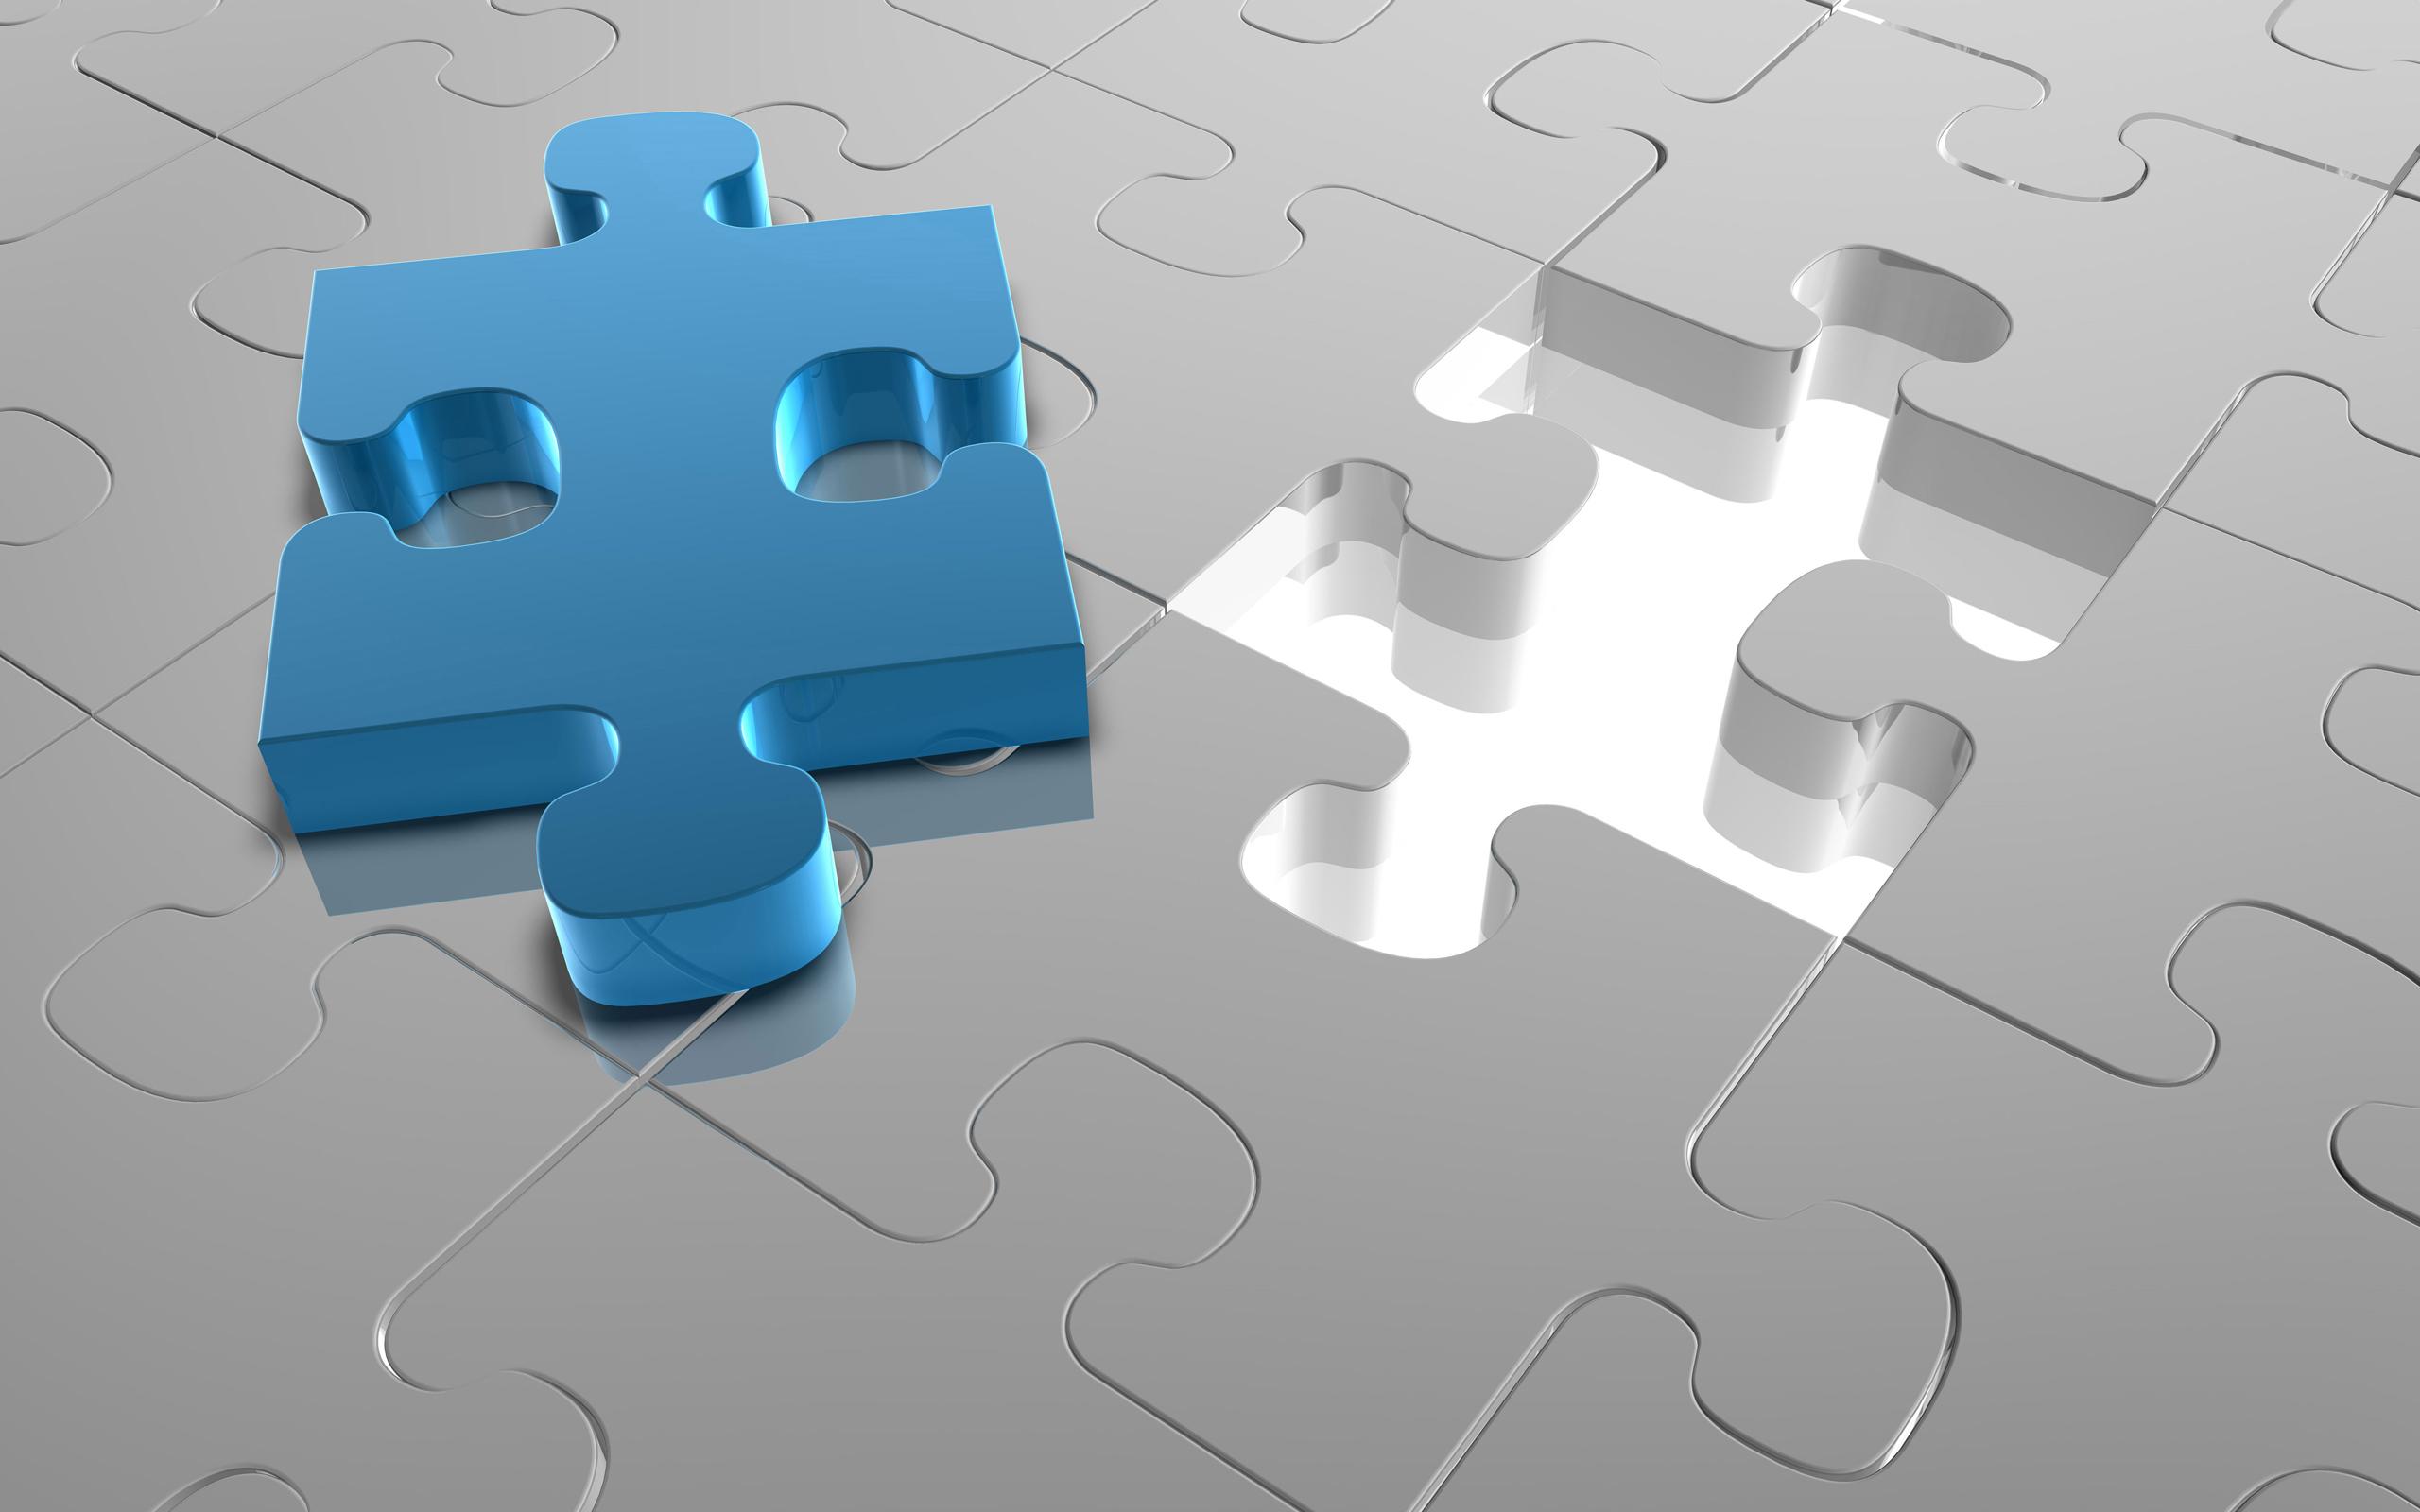 3d puzzle wallpaper background 53001